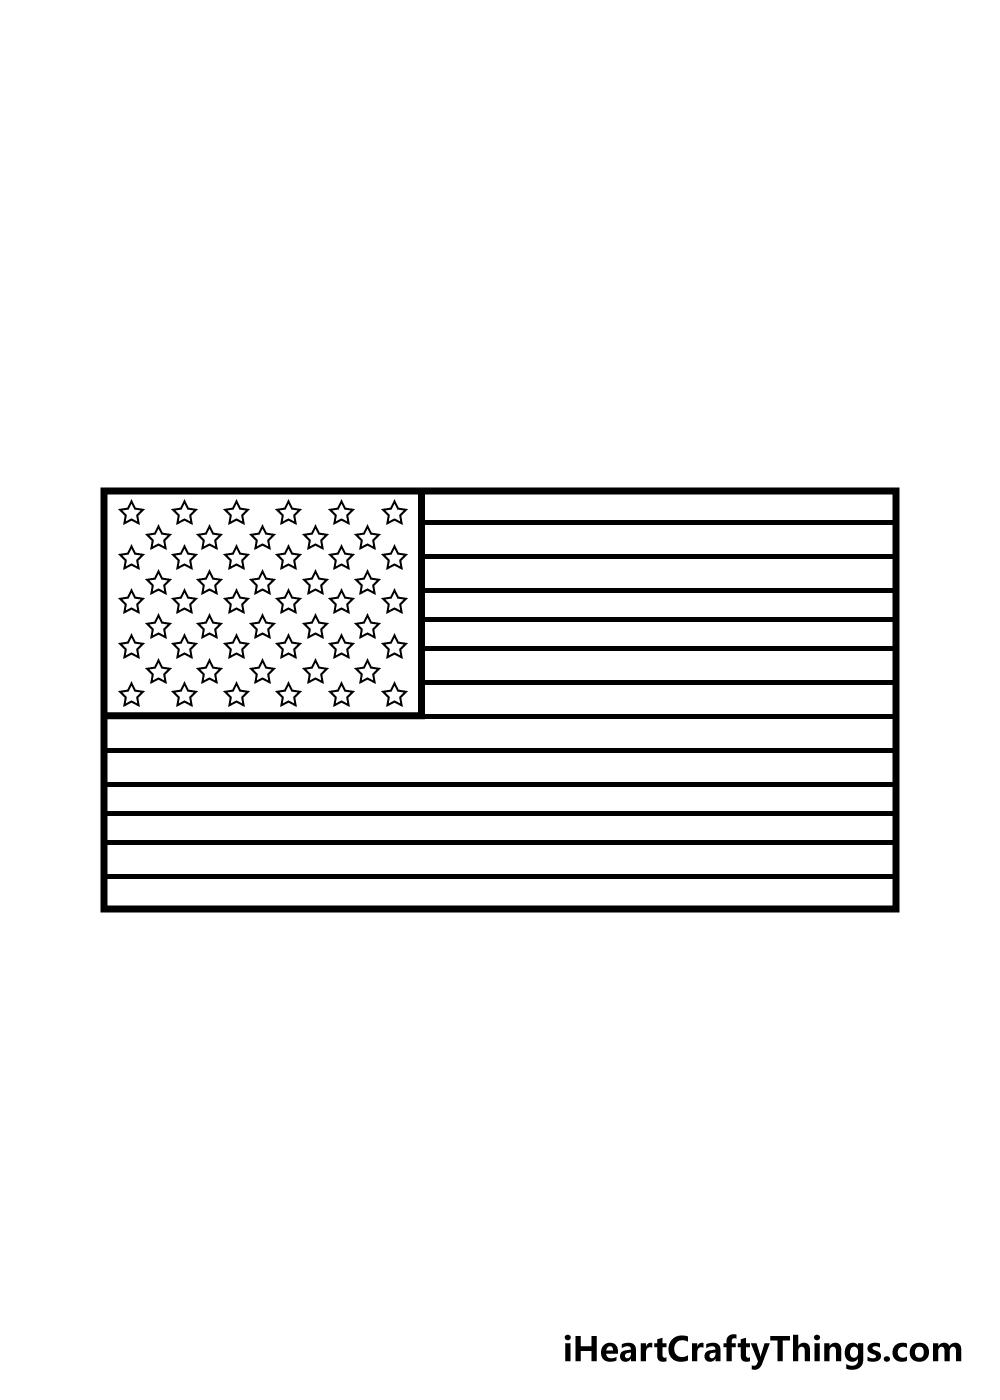 drawing american flag step 5